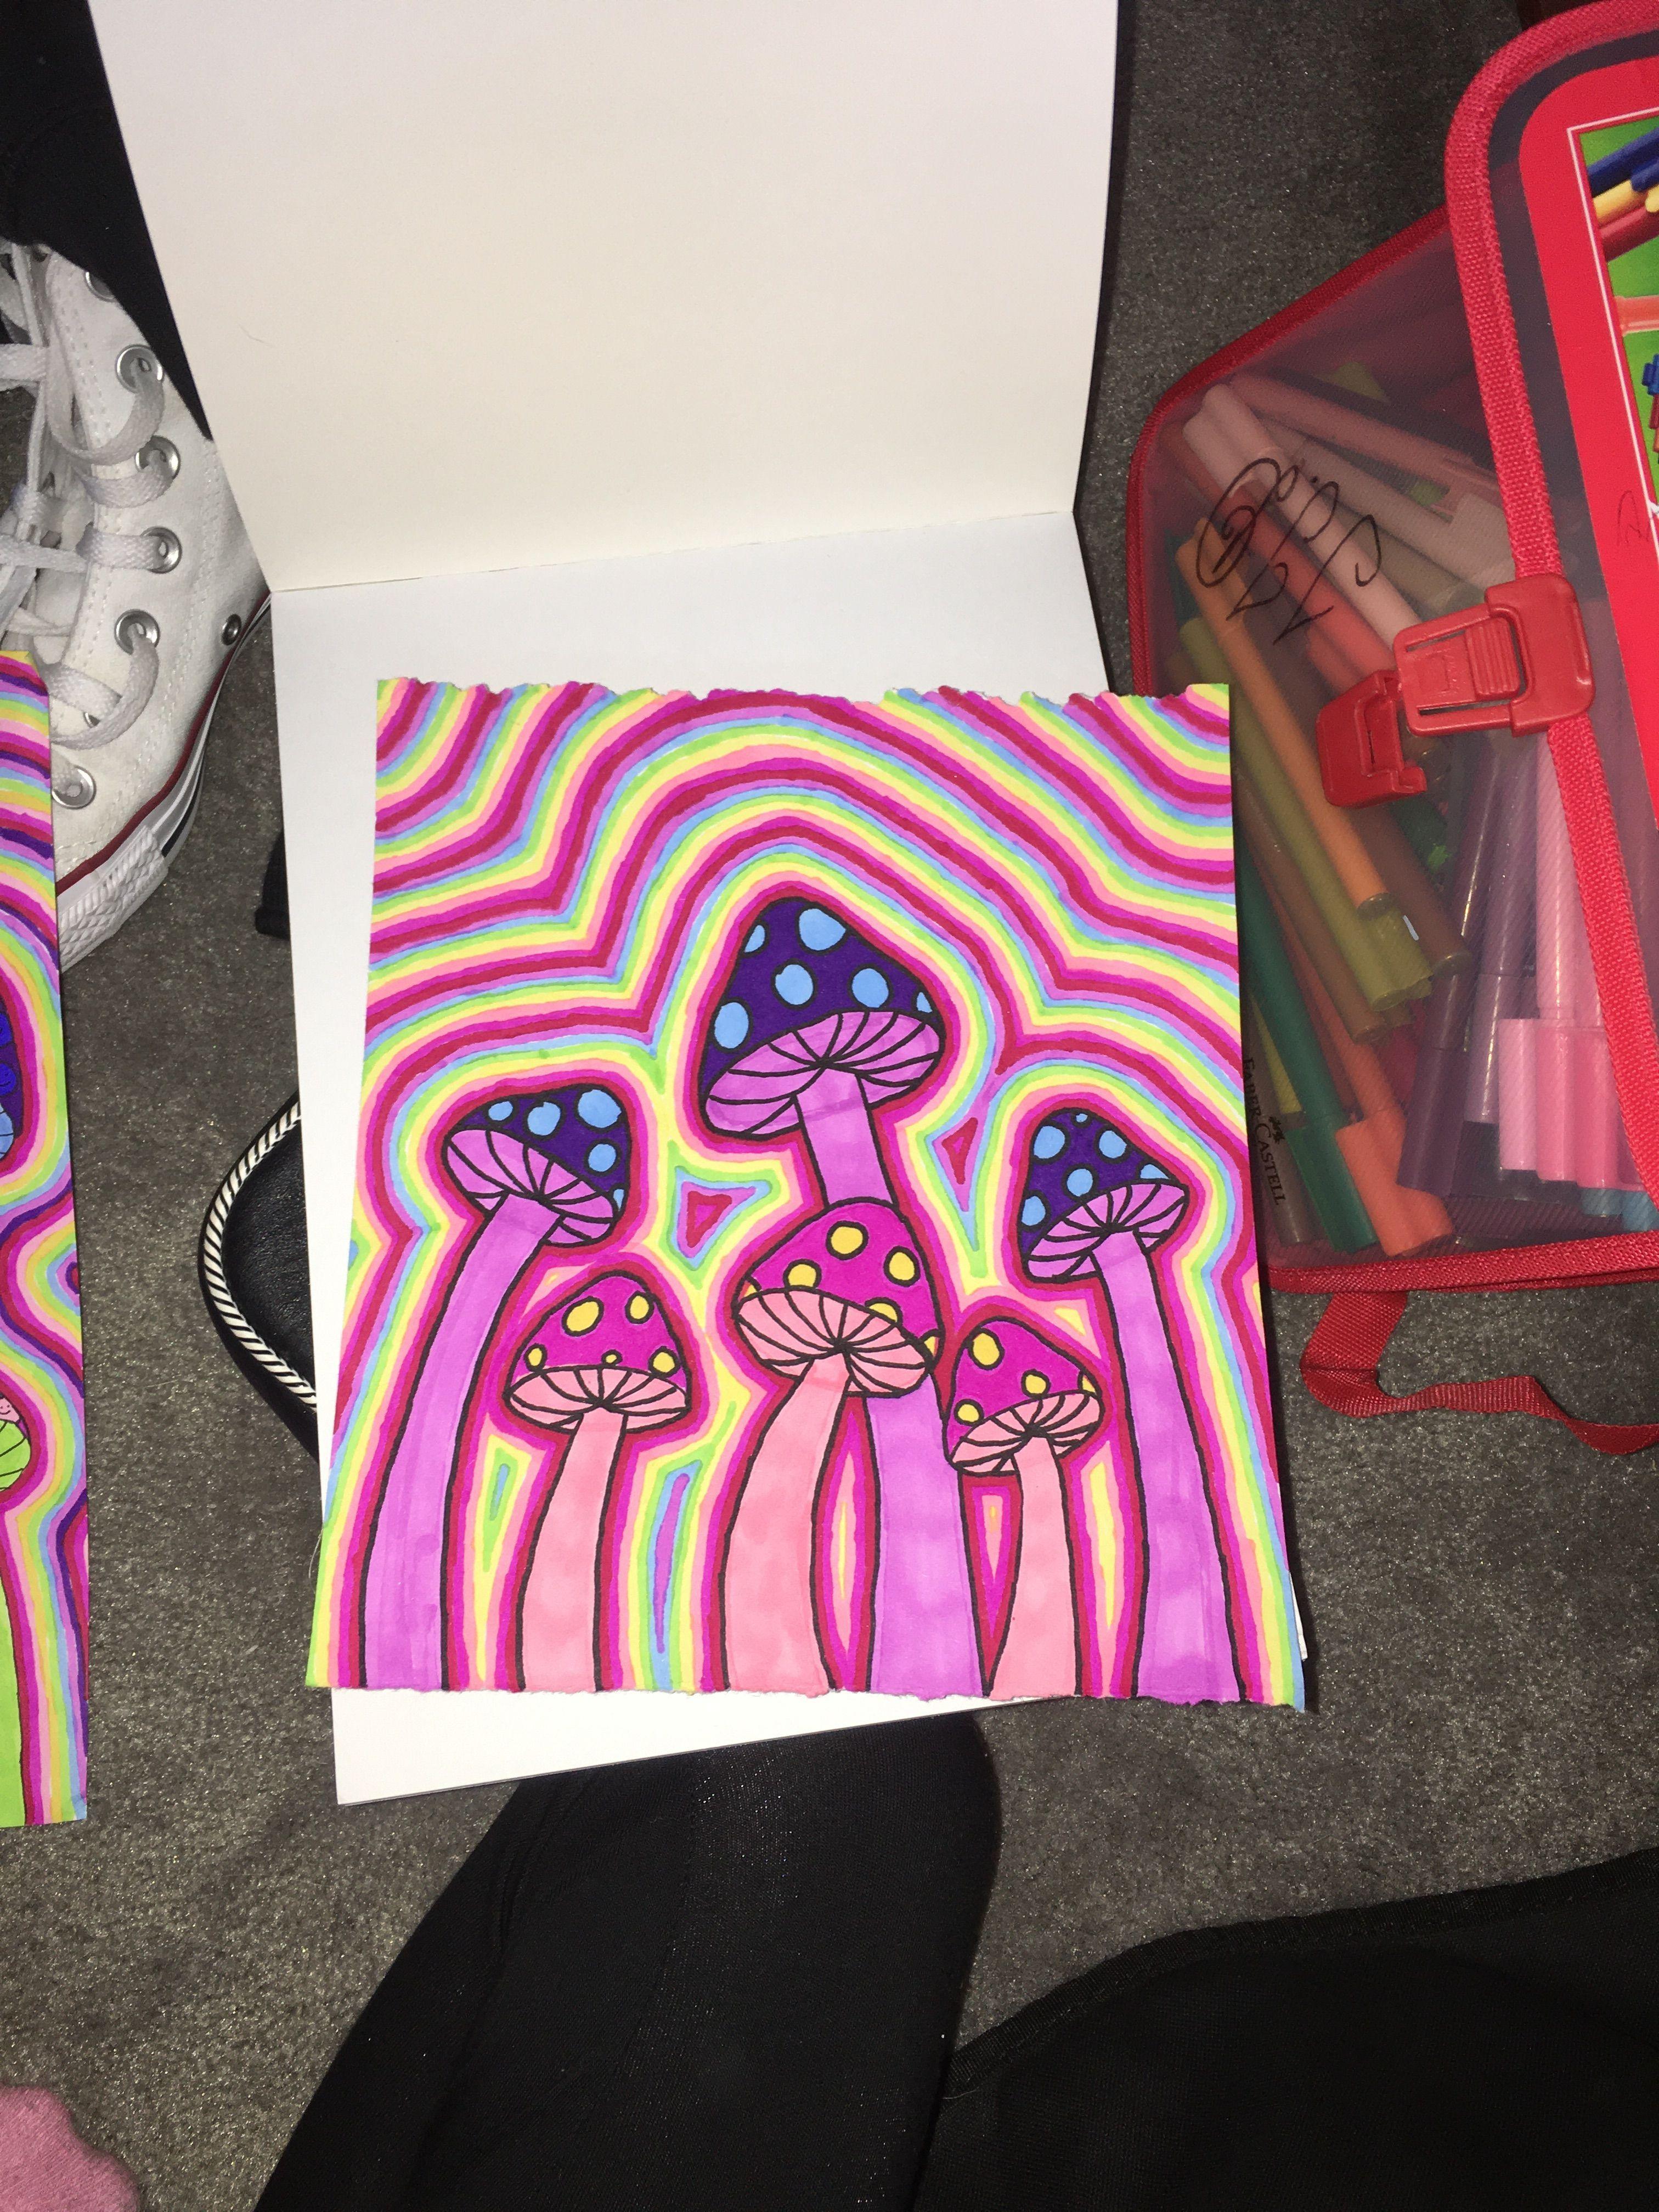 Body Art Trippy Tattoos Optical Illusions Optical Illusions Airbrushbodyart Art Body Il In 2020 Hippie Painting Hippie Art Mini Canvas Art